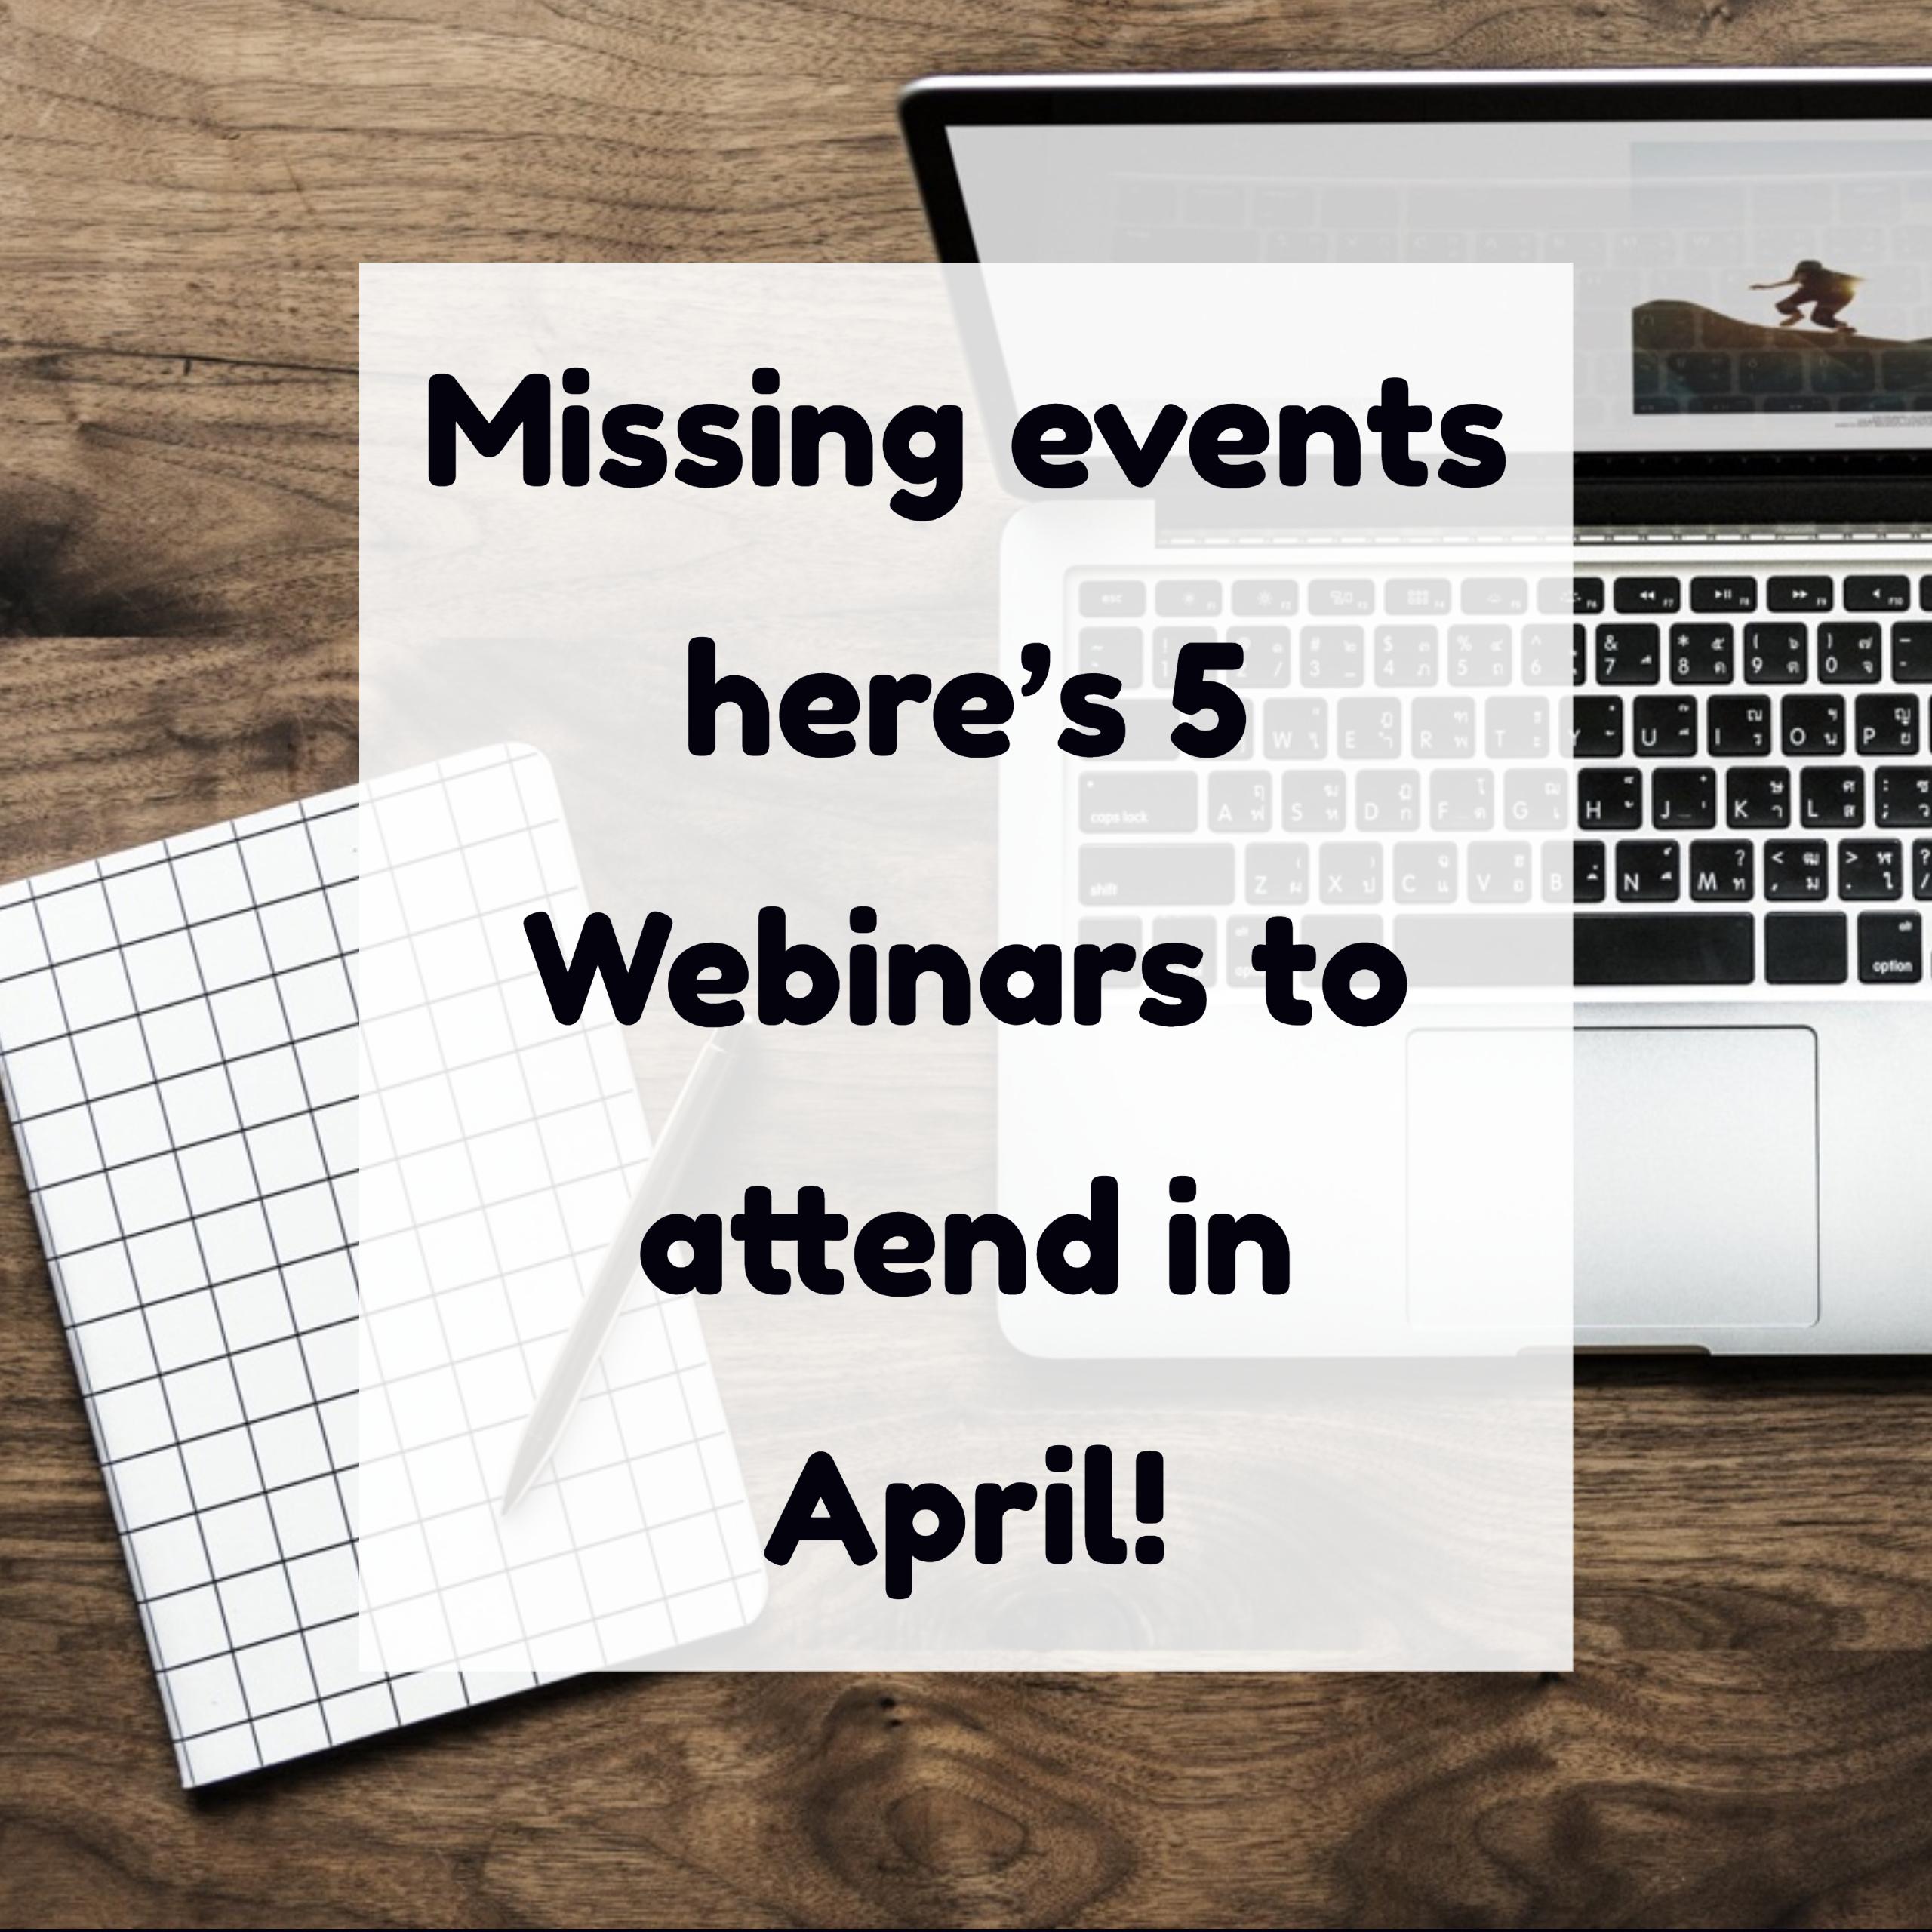 5 Webinars for April